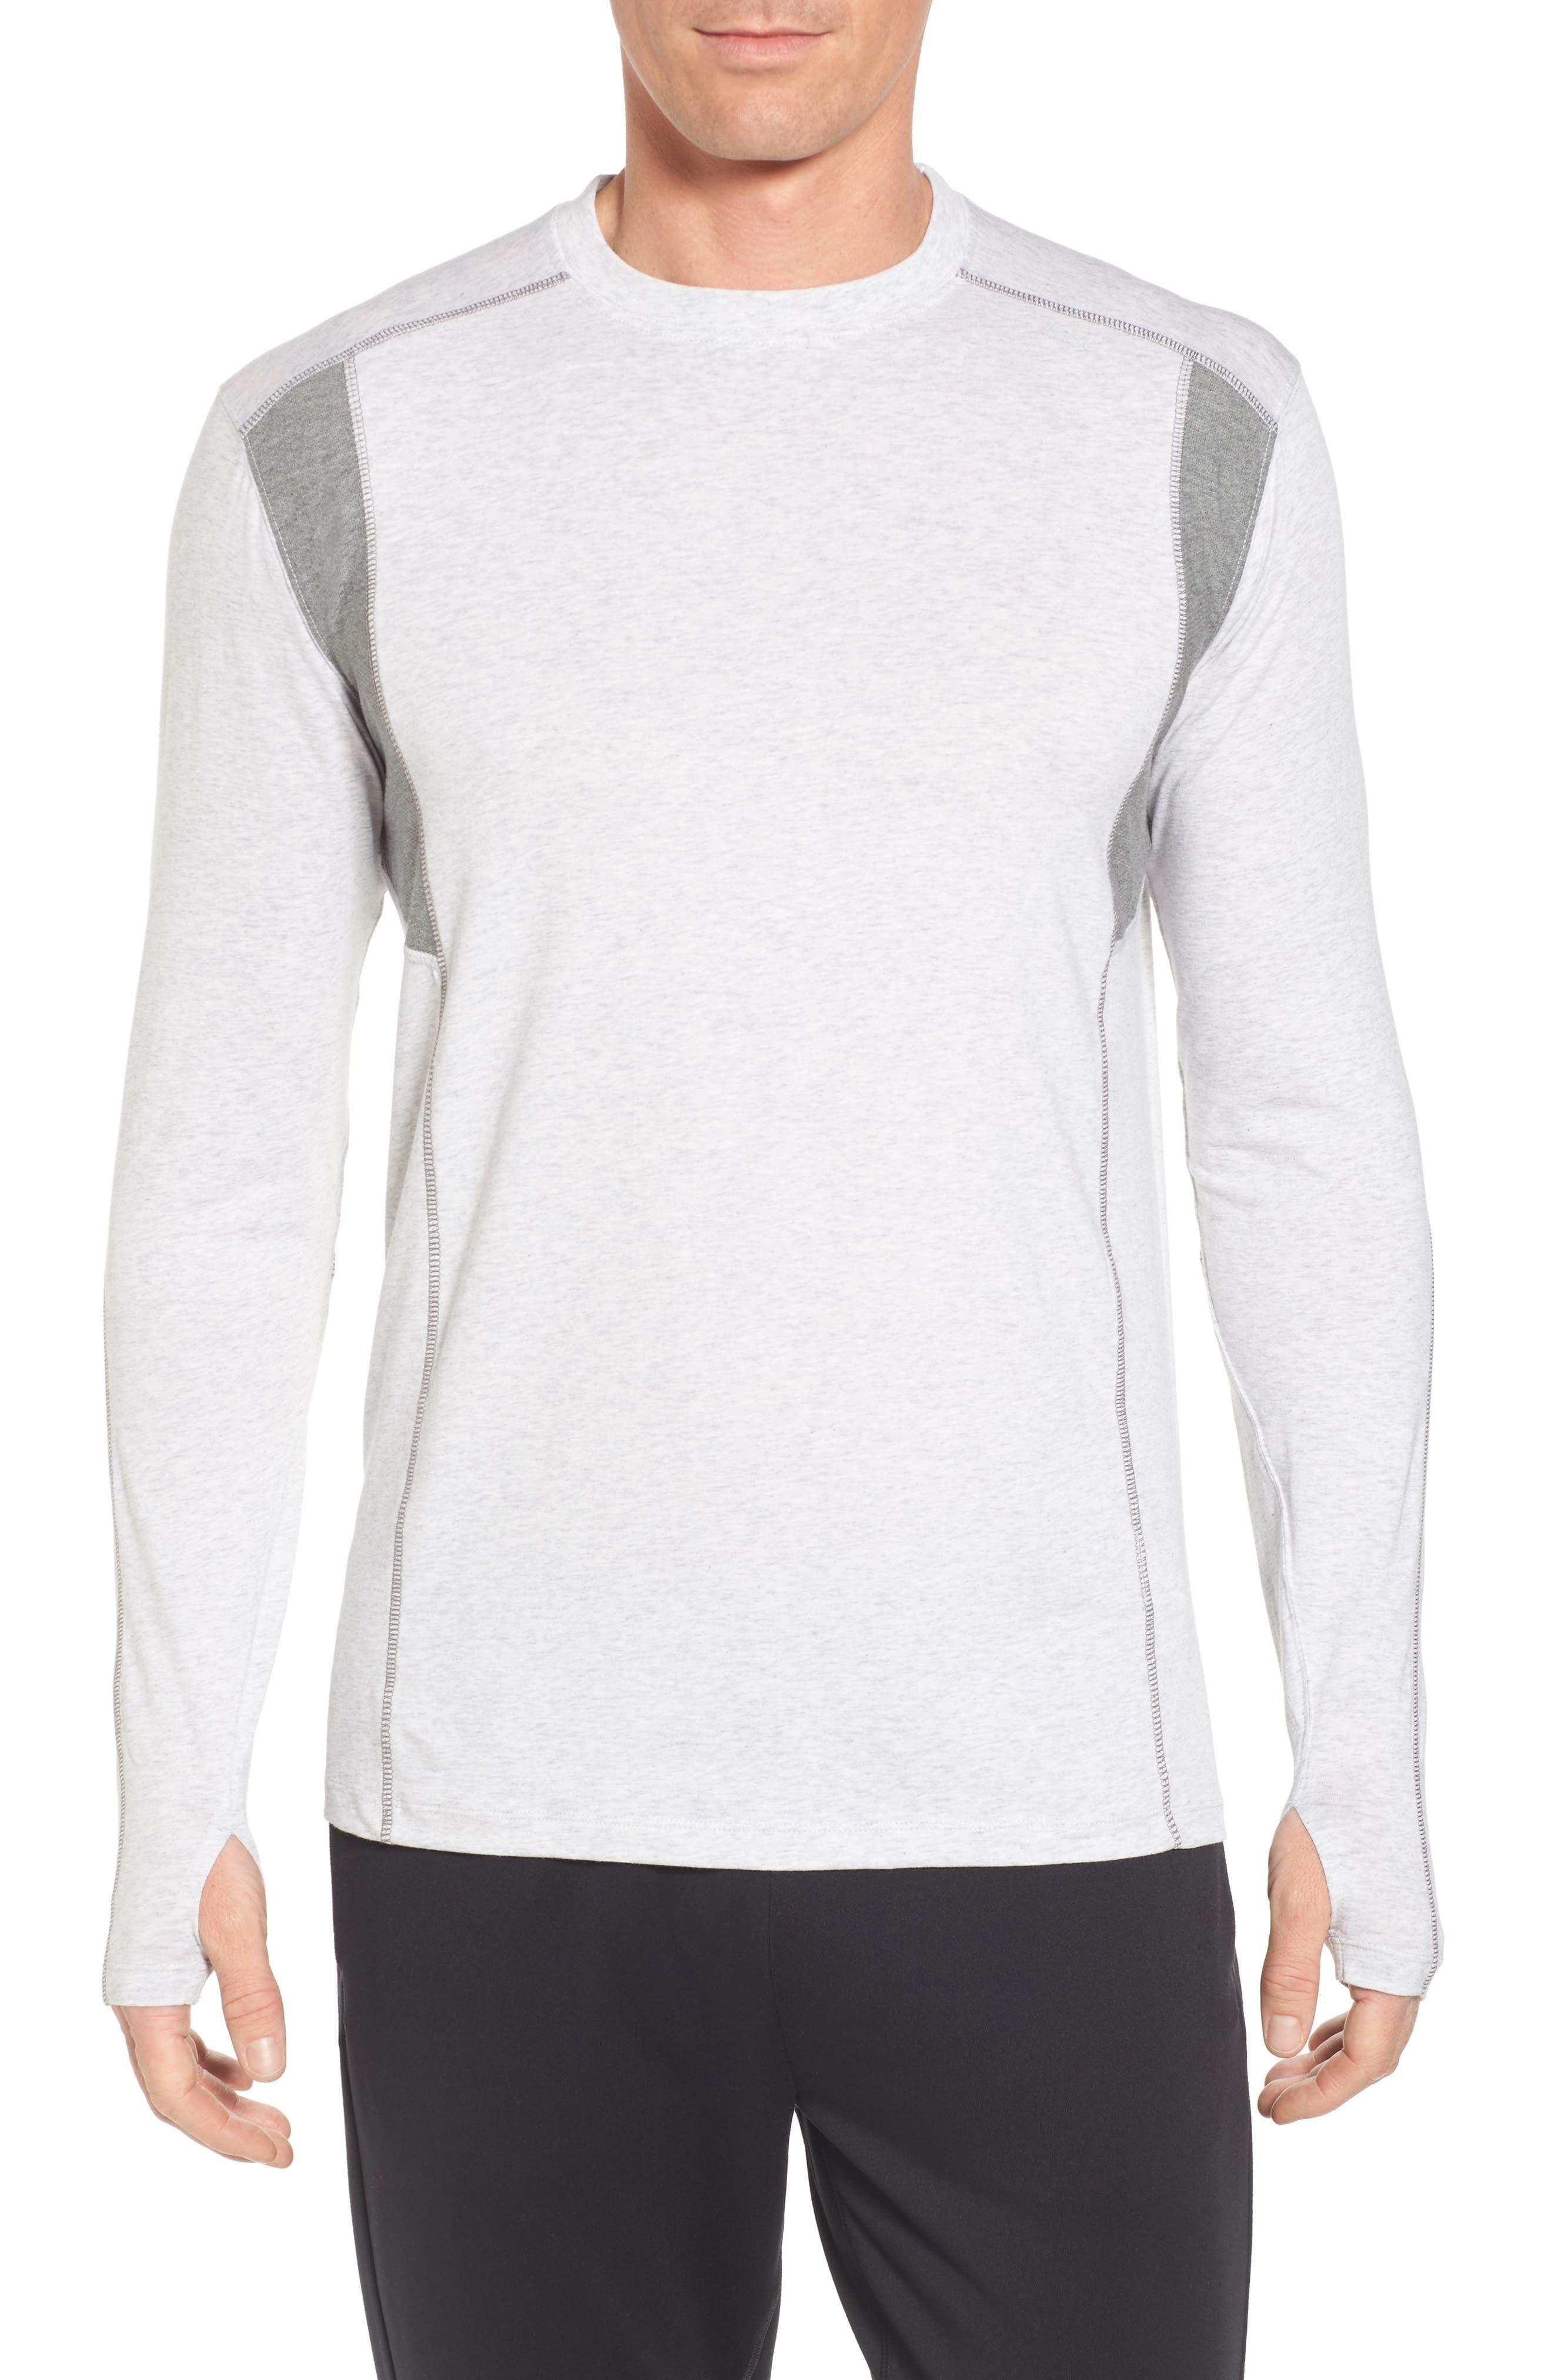 Alternate Image 1 Selected - tasc Performance Charge Sweatshirt